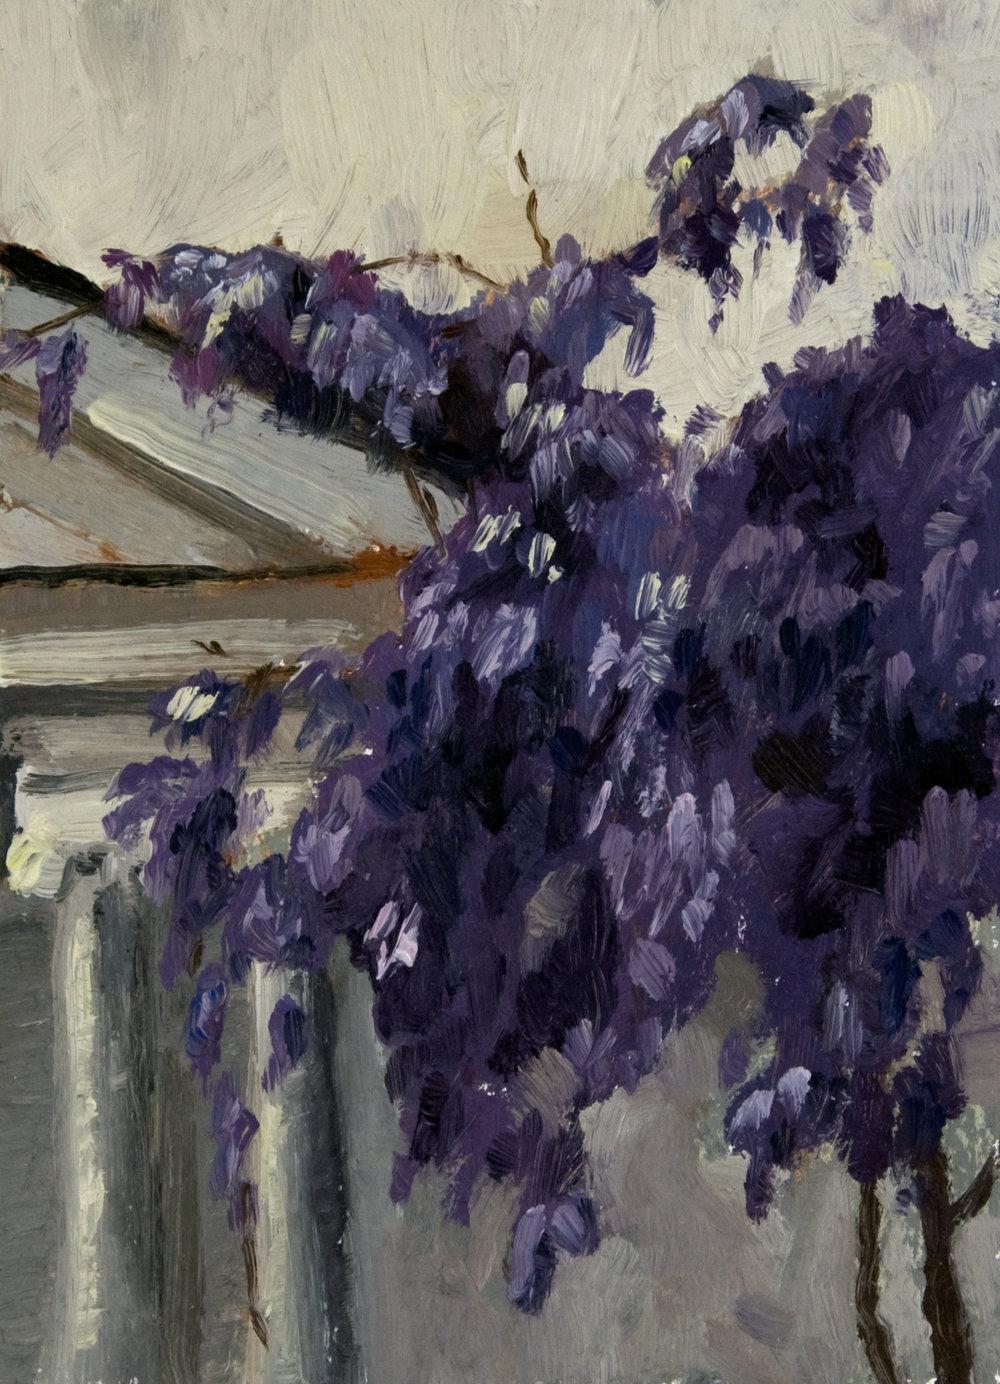 20130418-023-wisteria-7x5.jpg